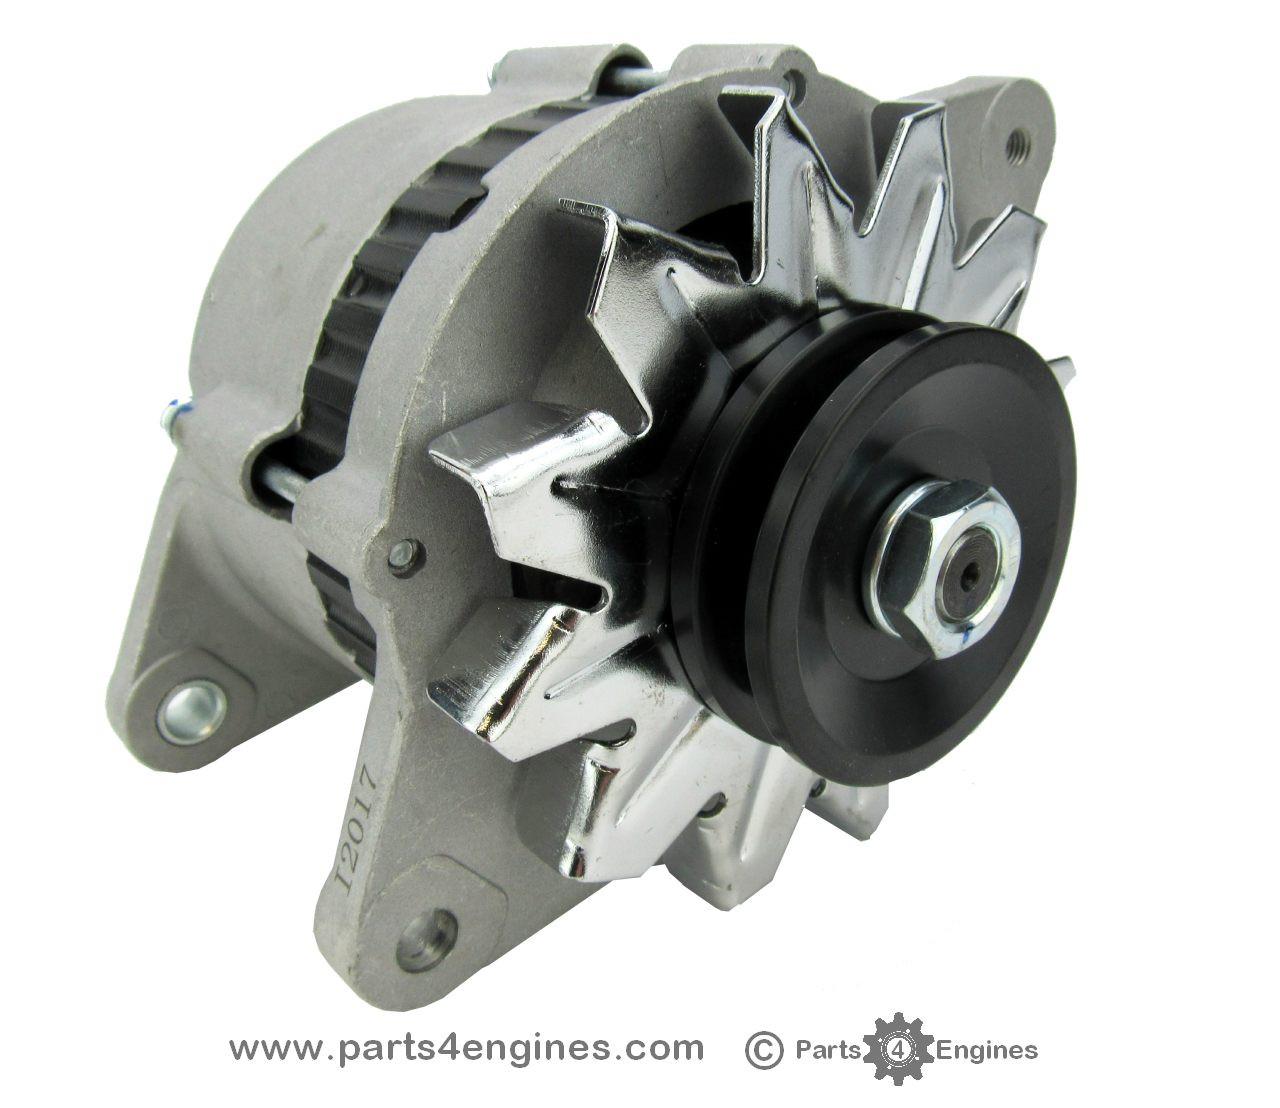 Yanmar 3GM30 alternator - parts4engines.com